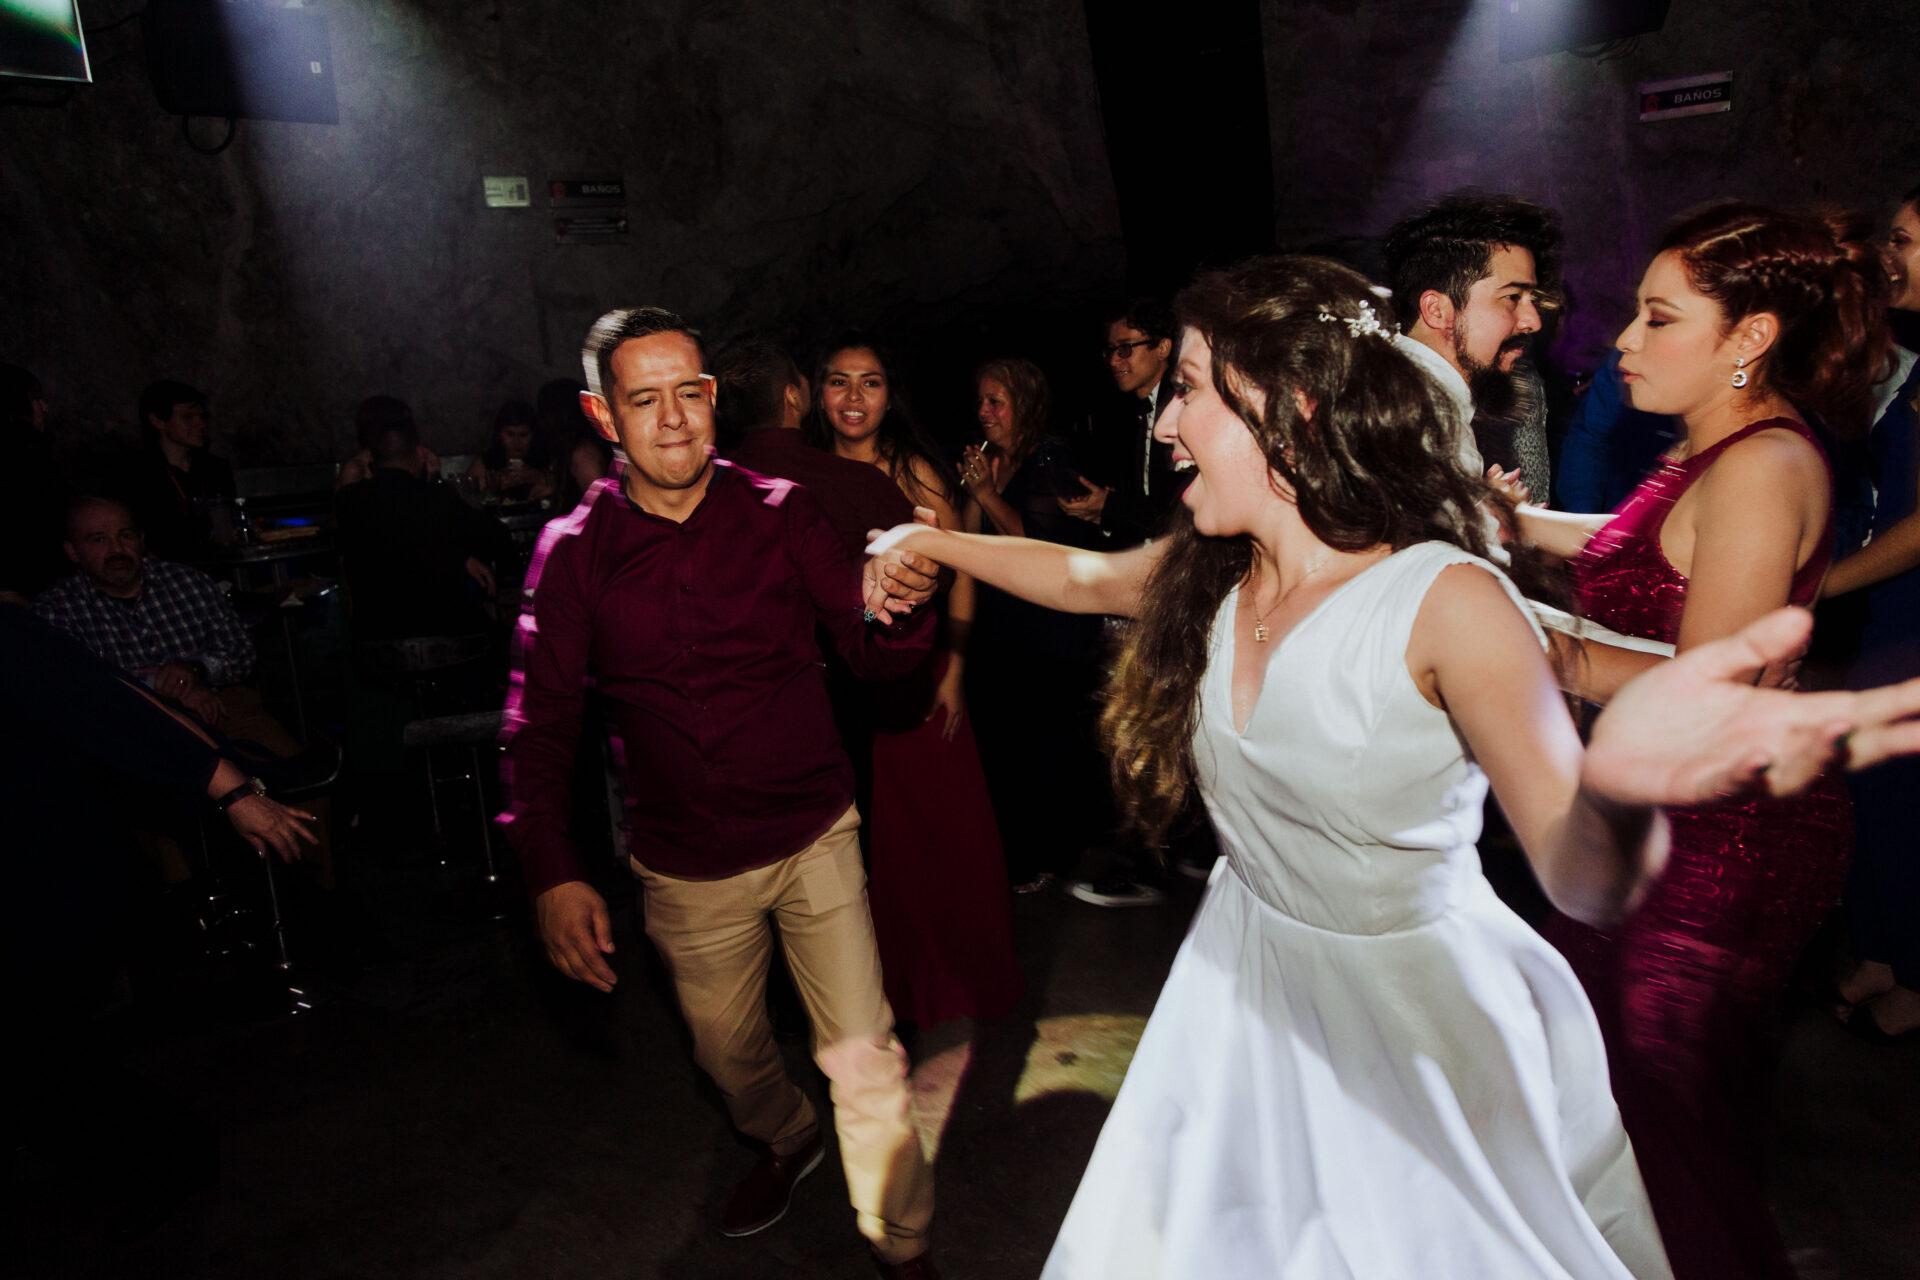 javier_noriega_fotografo_bodas_la_mina_club_zacatecas_wedding_photographer31